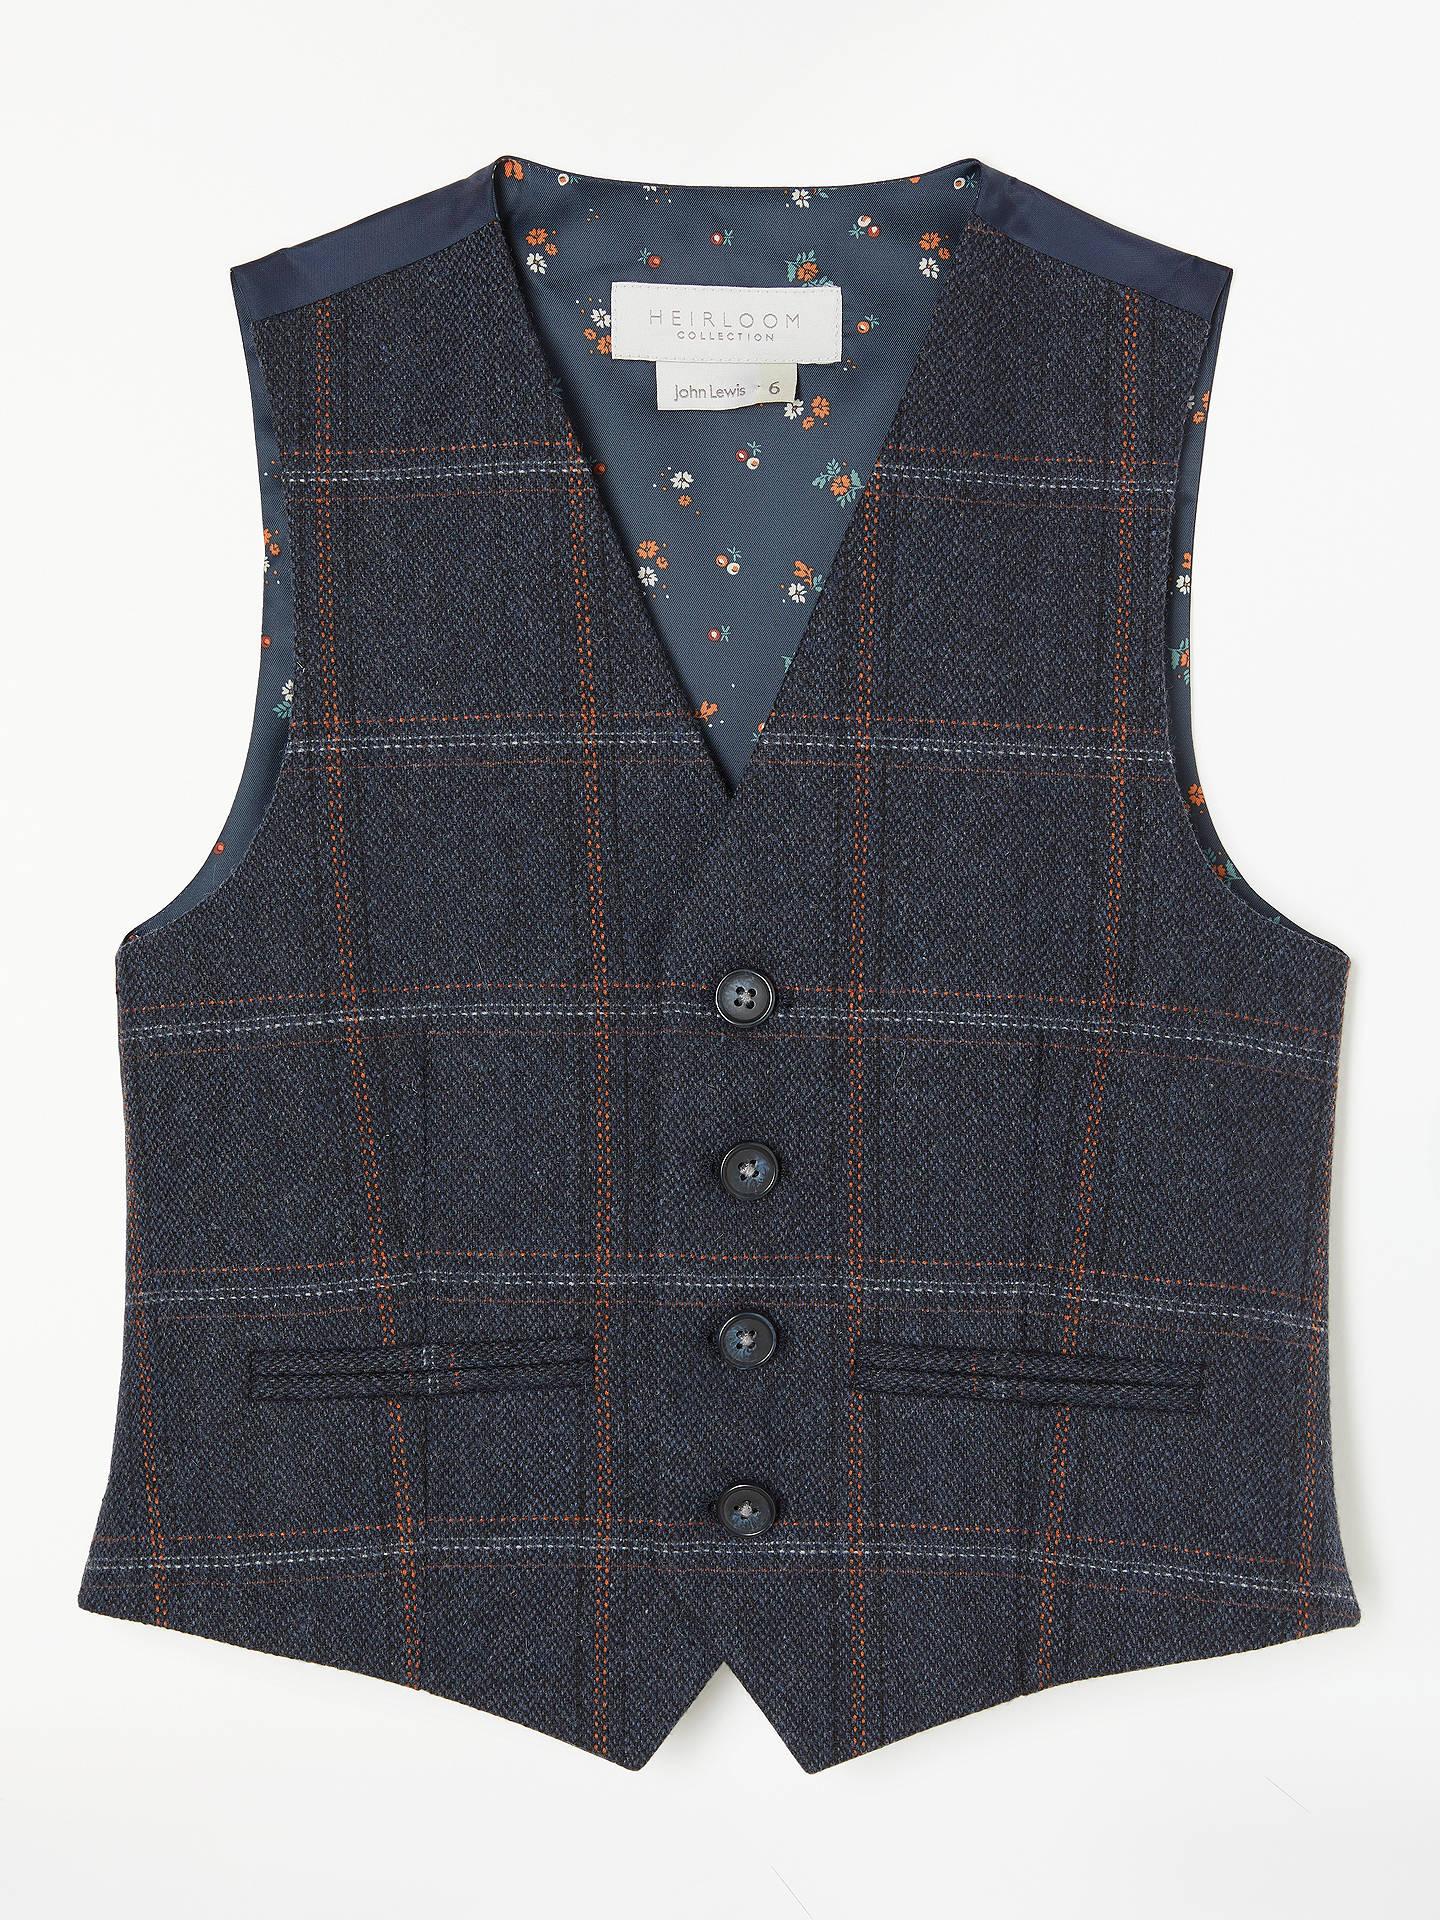 c67e6a6c1e5 Buy John Lewis   Partners Heirloom Collection Boys  Check Tweed Waistcoat